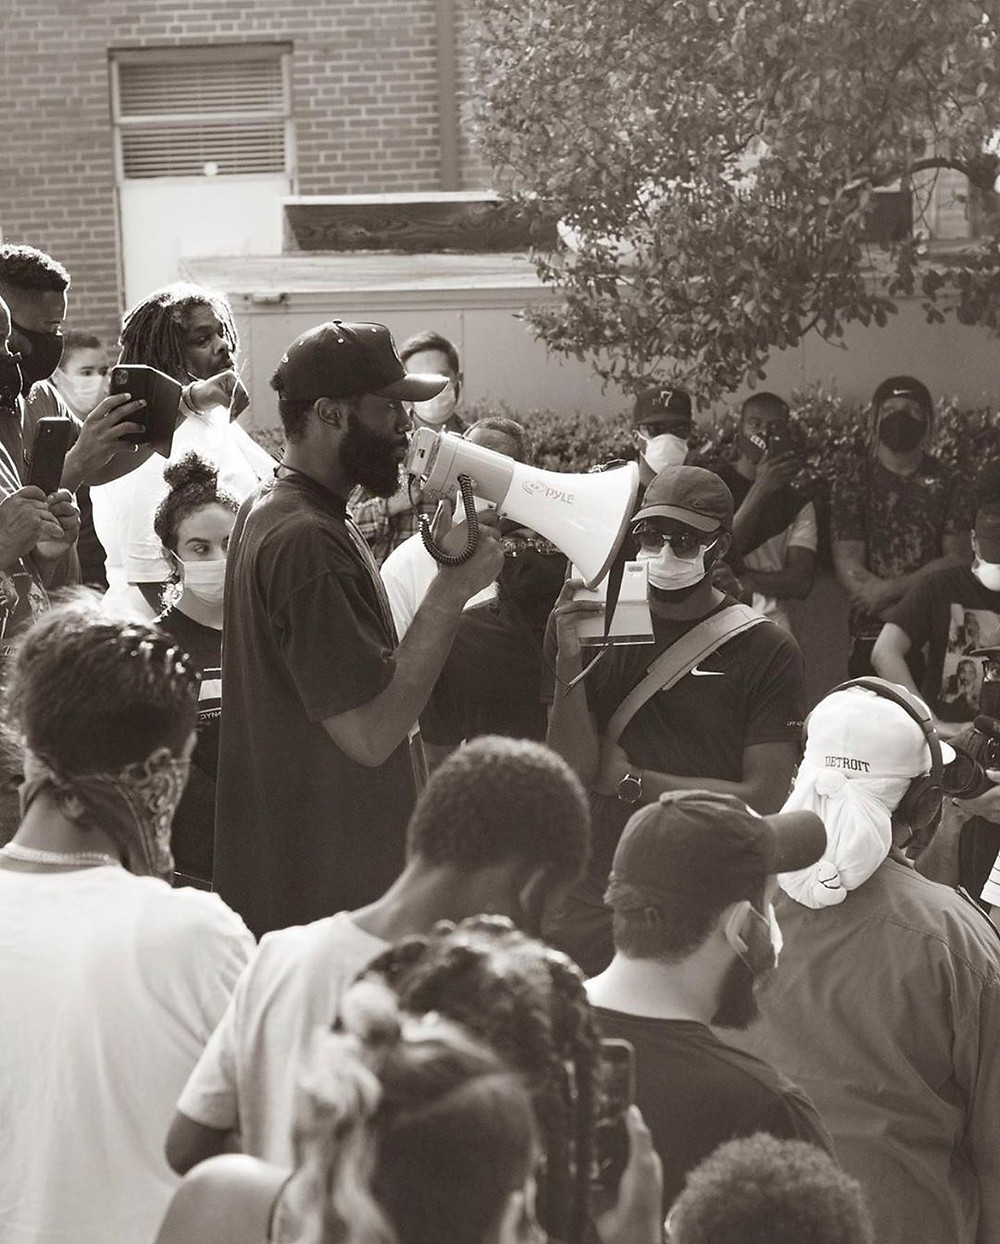 jaylen_brown_black_lives_matter_NBA_Around_the_Game